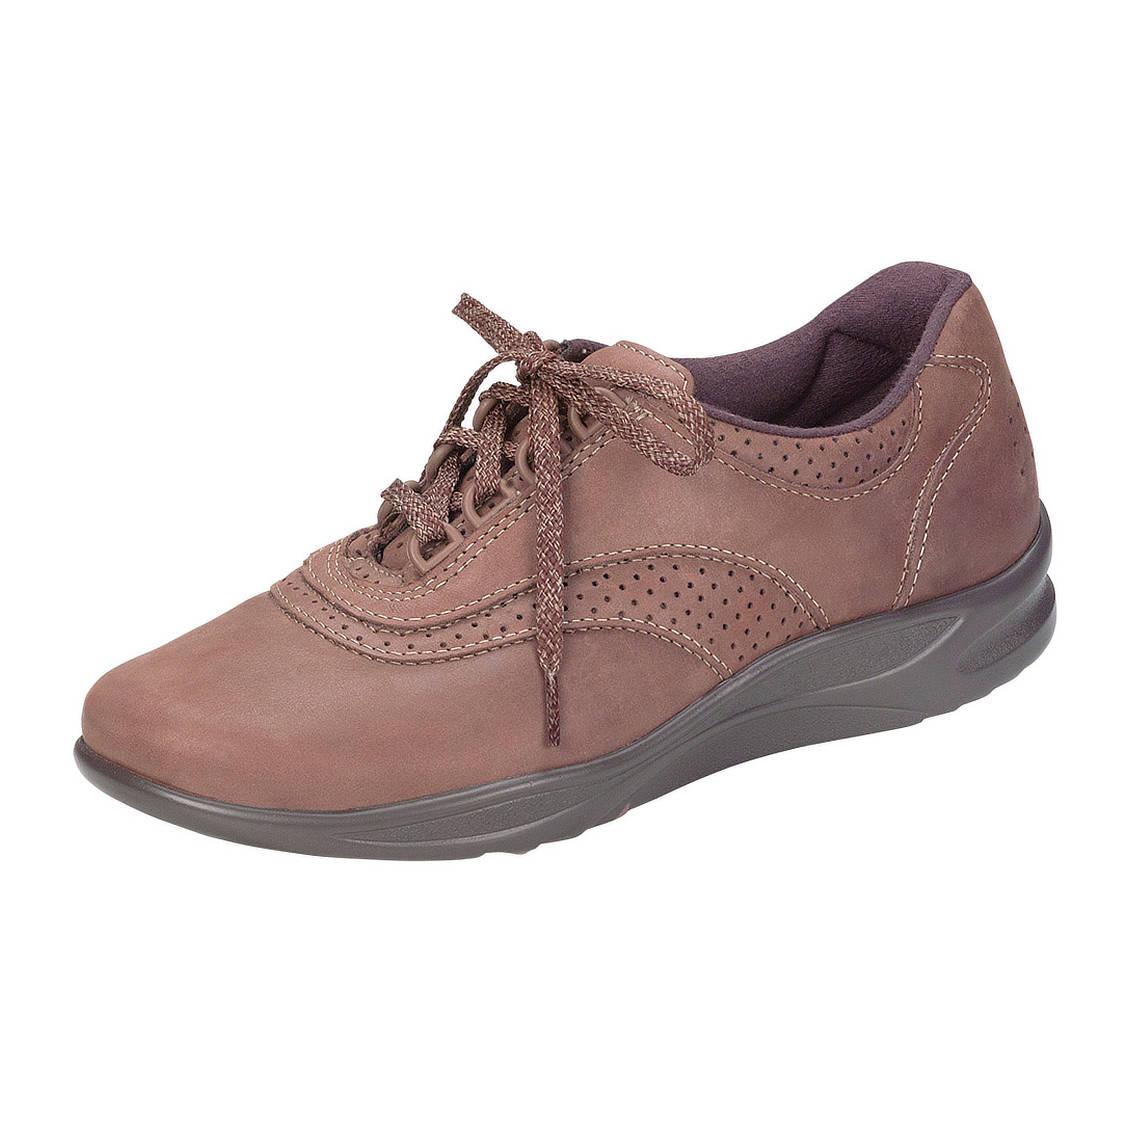 sas-womens-walk-easy-chocolate-nubuck-2380-076-2